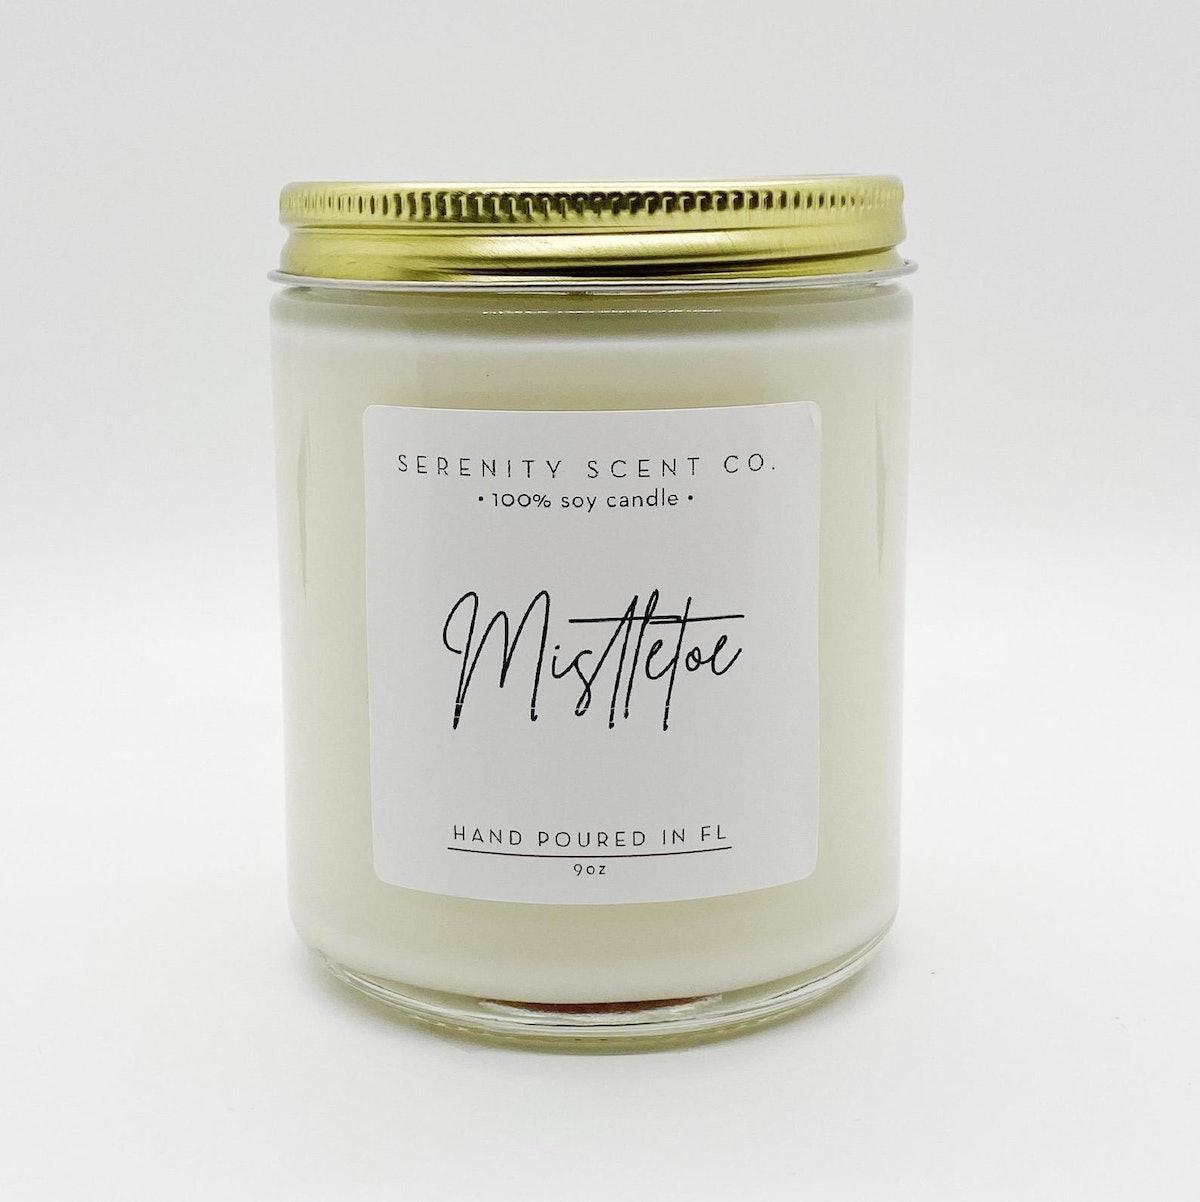 Mistletoe | Handmade Soy Candle | 100% Soy Wax